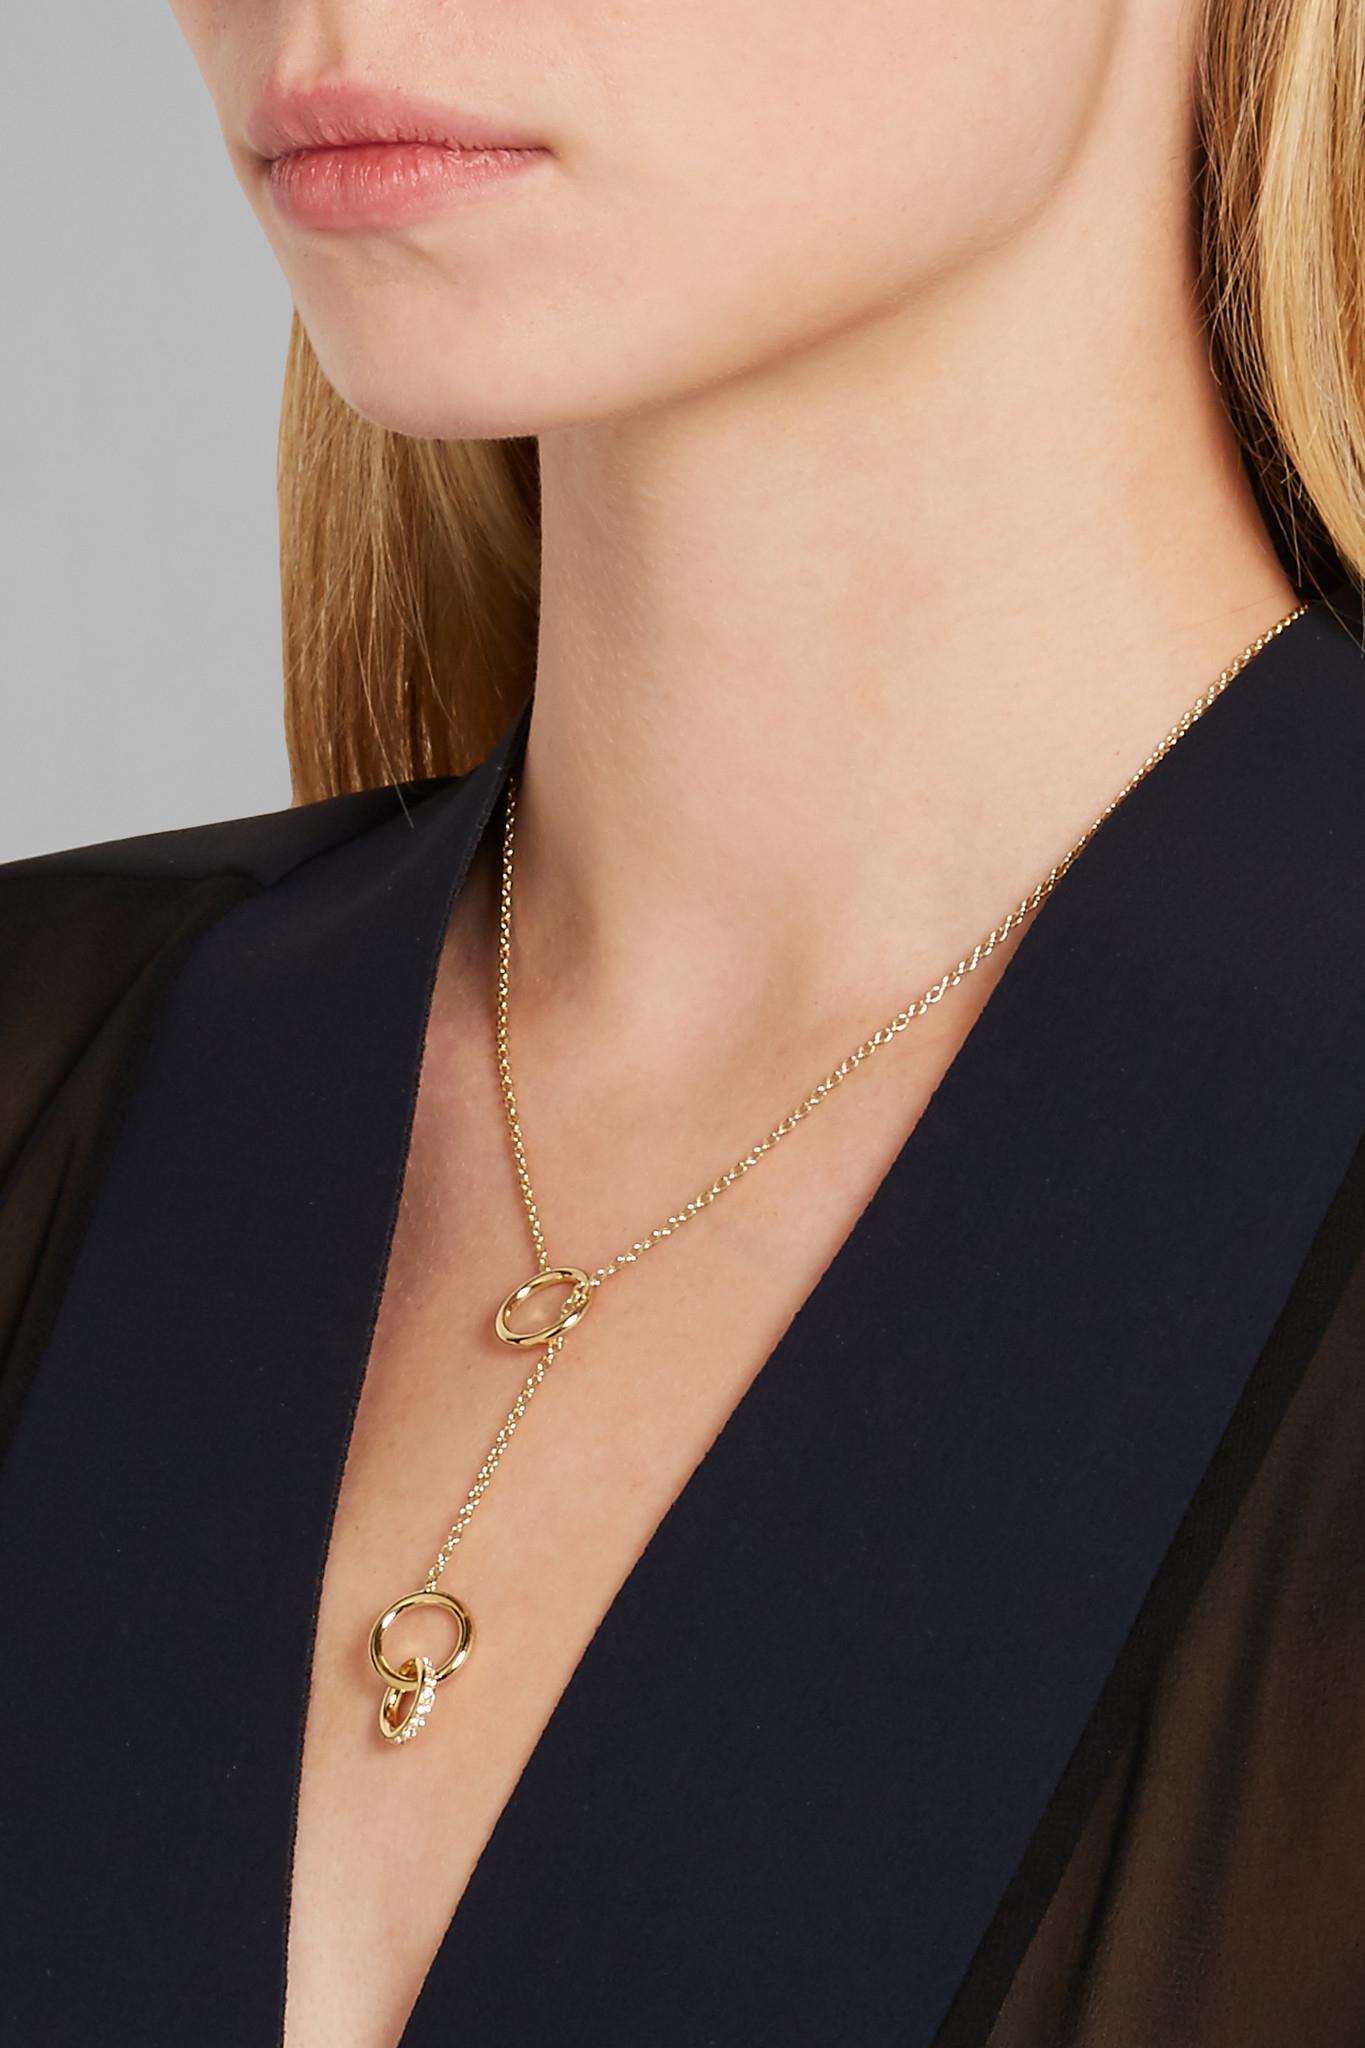 Elizabeth & James Neko Necklace in Metallic Gold 5I1yHKUx